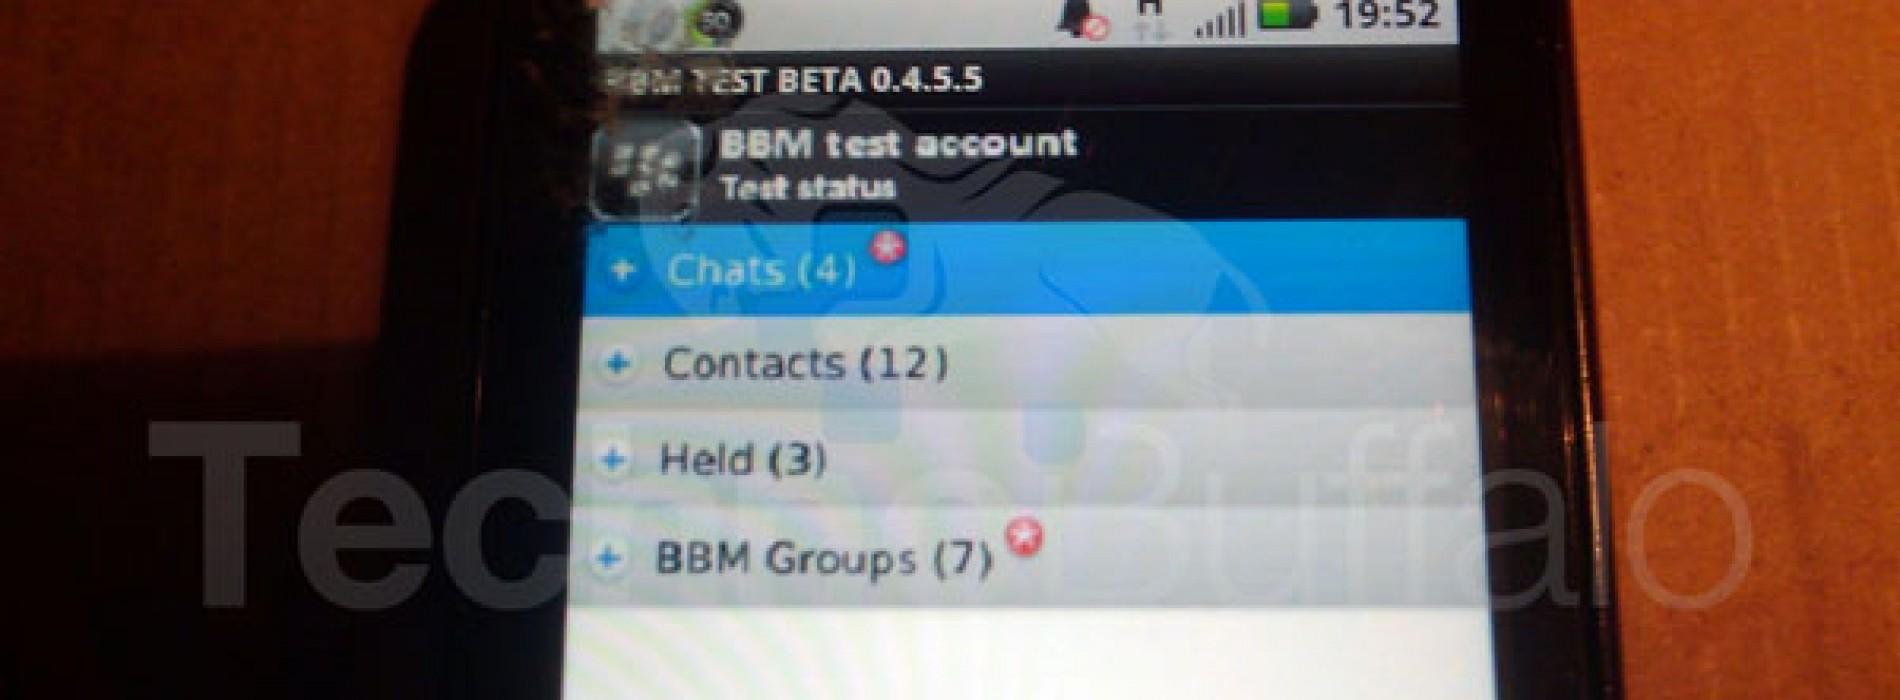 صور | تطبيق بلاك بيري ماسنجر BBM .. قريبا للاندرويد !